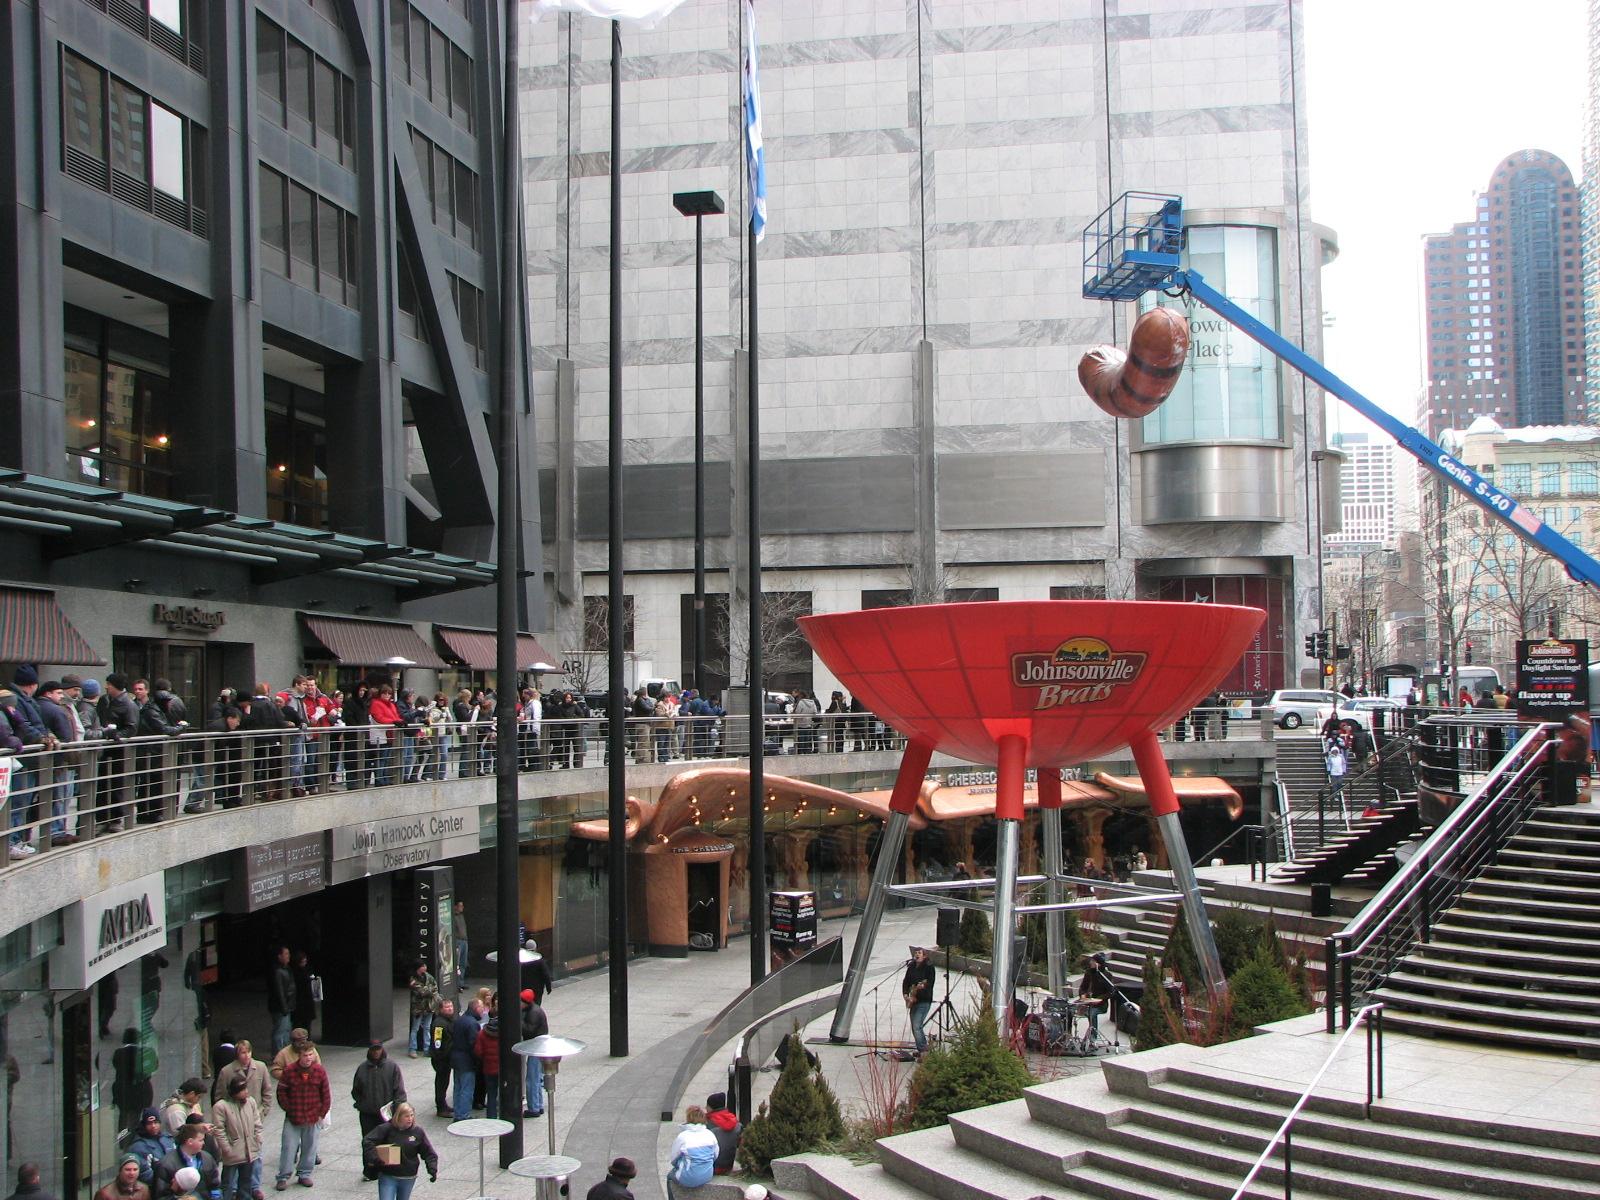 large public marketing installations